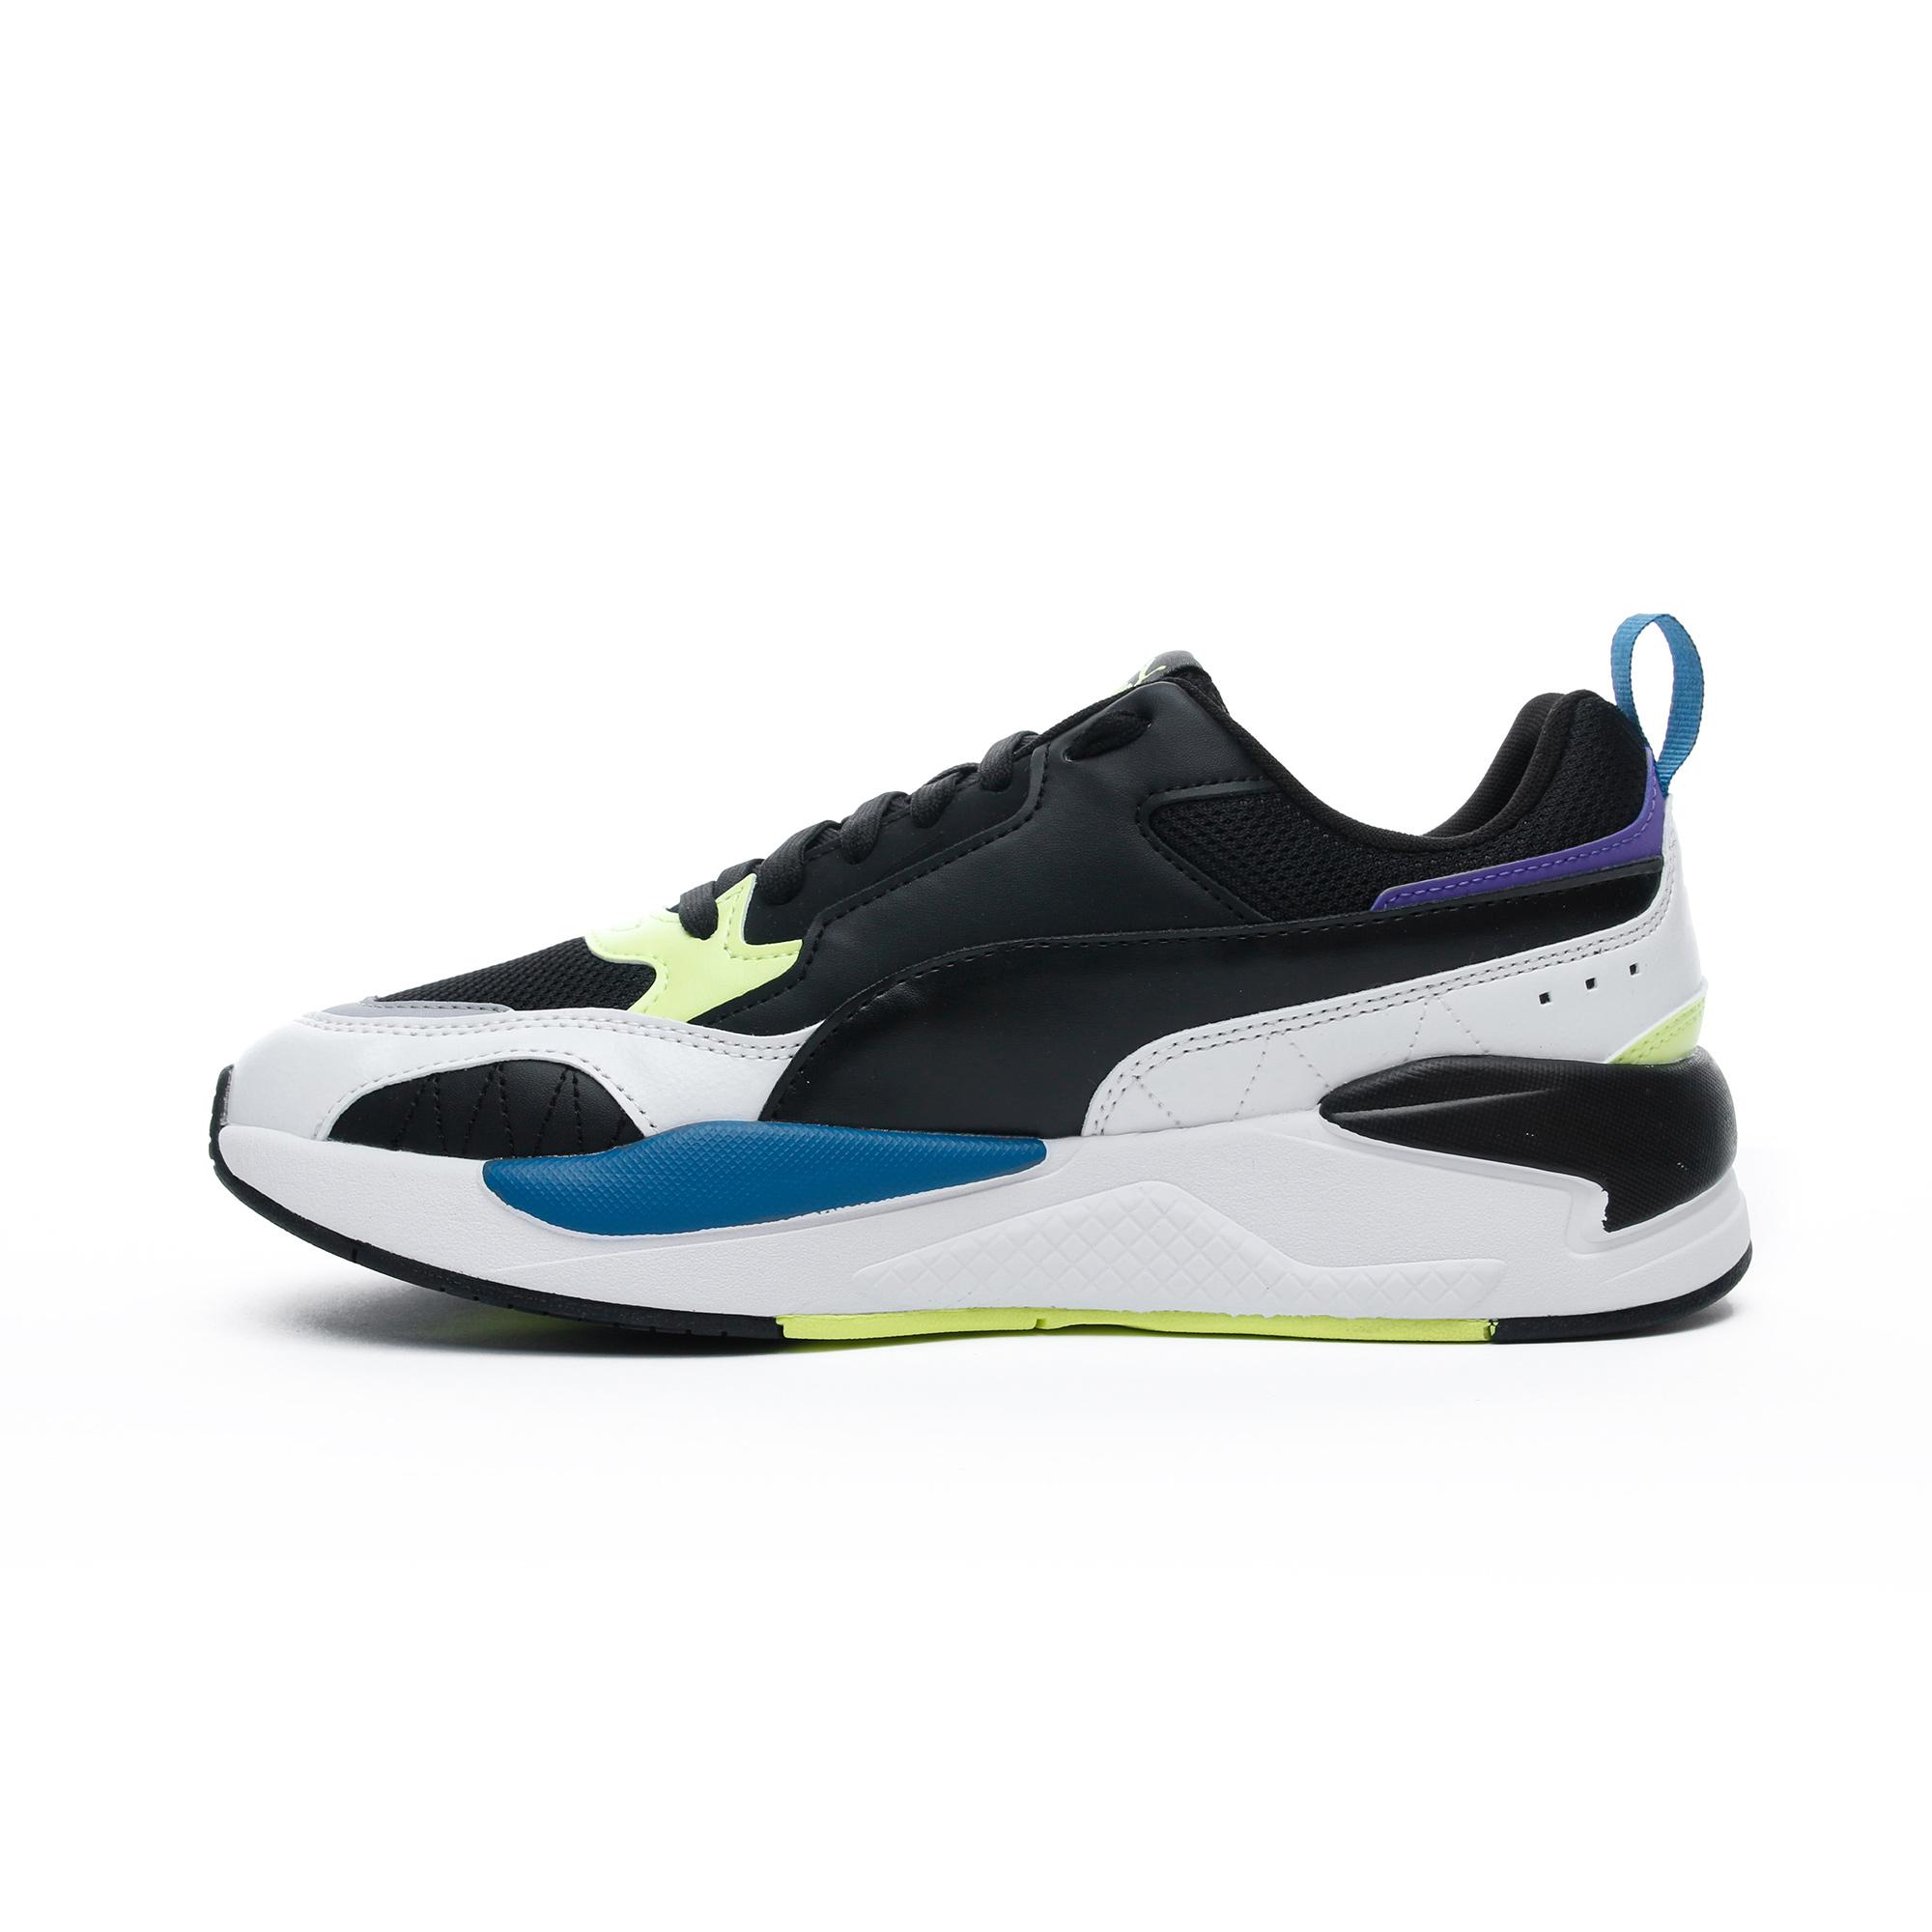 Puma X-Ray 2 Square Erkek Siyah Spor Ayakkabı